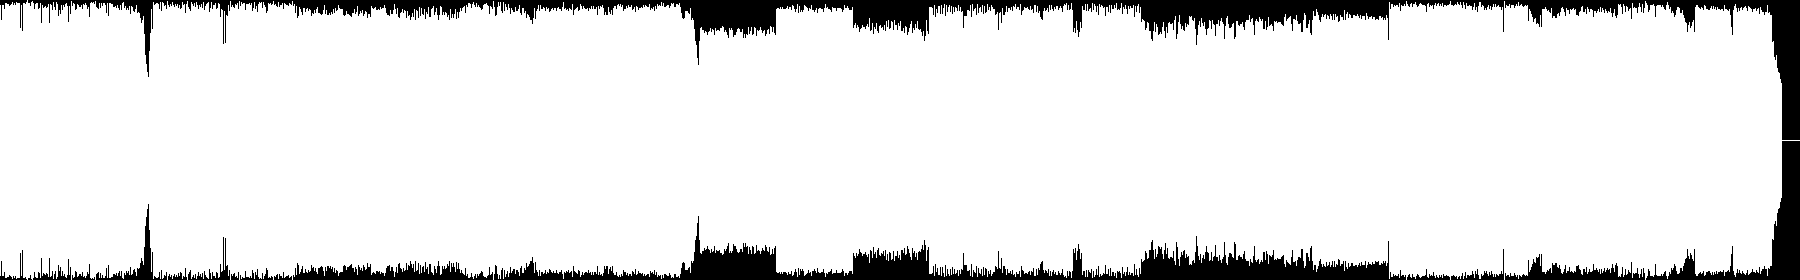 EDM 2016 audio waveform